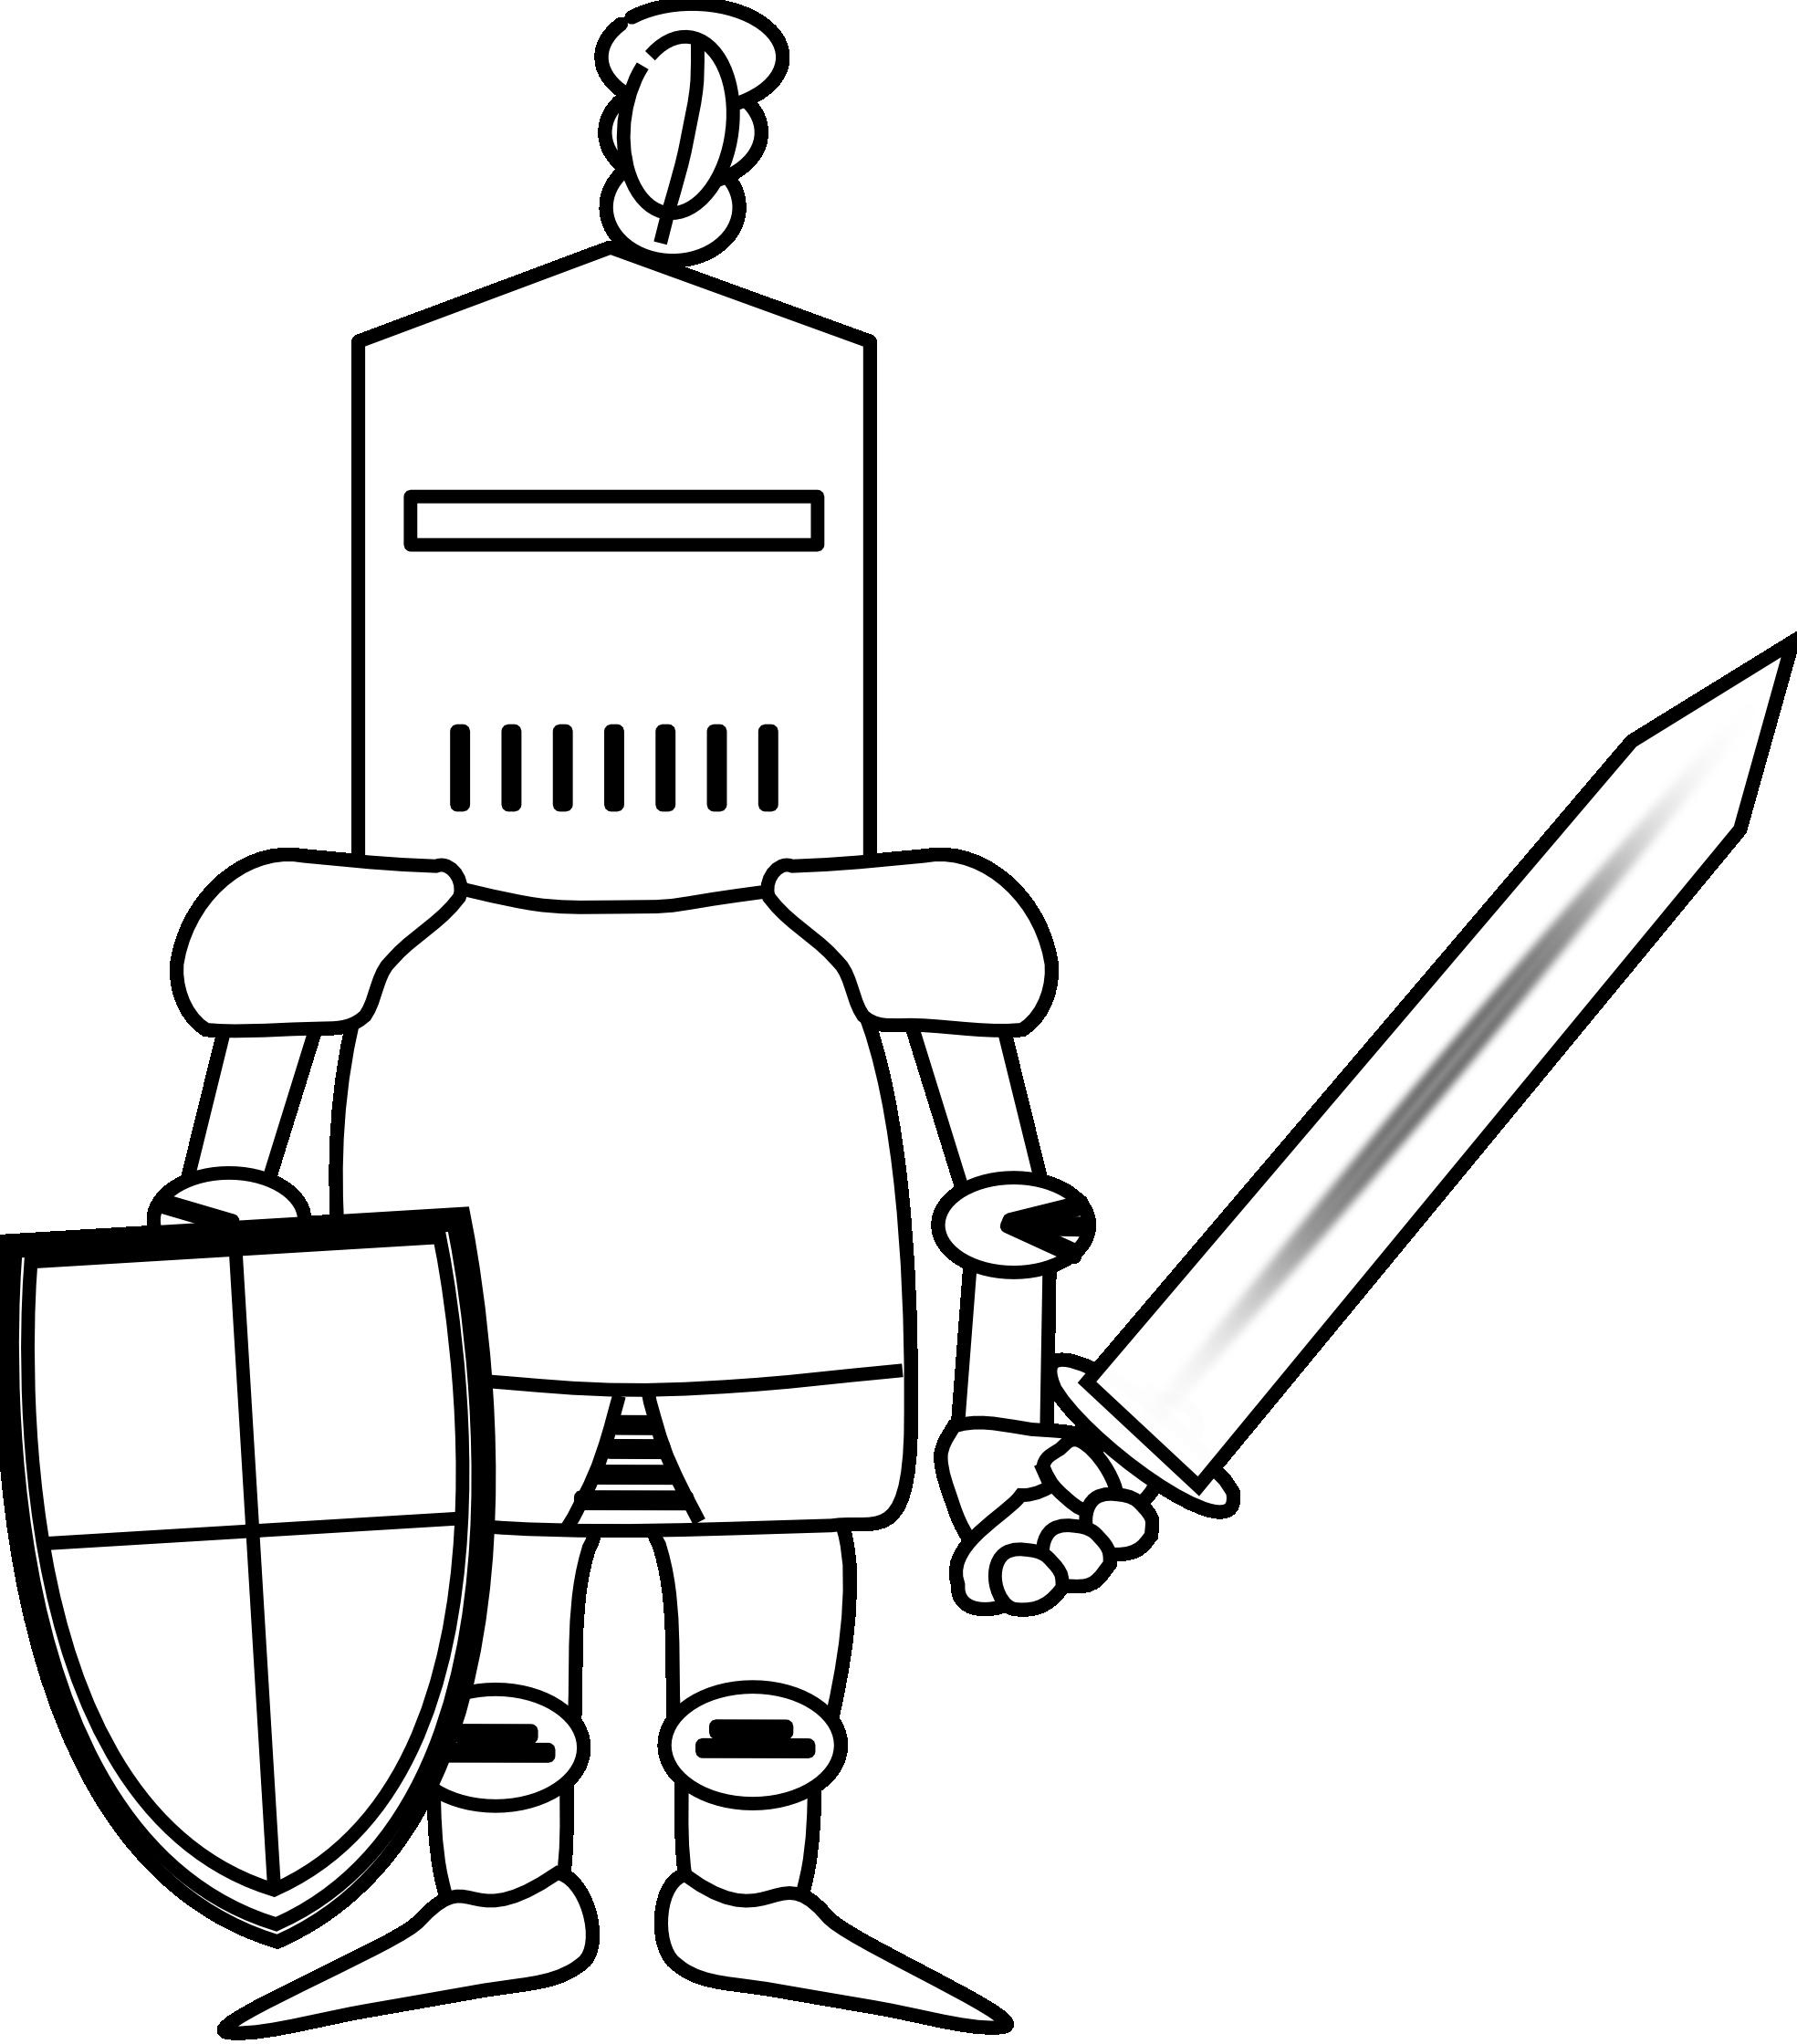 Knight armor clipart vector transparent stock Free Knight In Armor Clipart, Download Free Clip Art, Free ... vector transparent stock